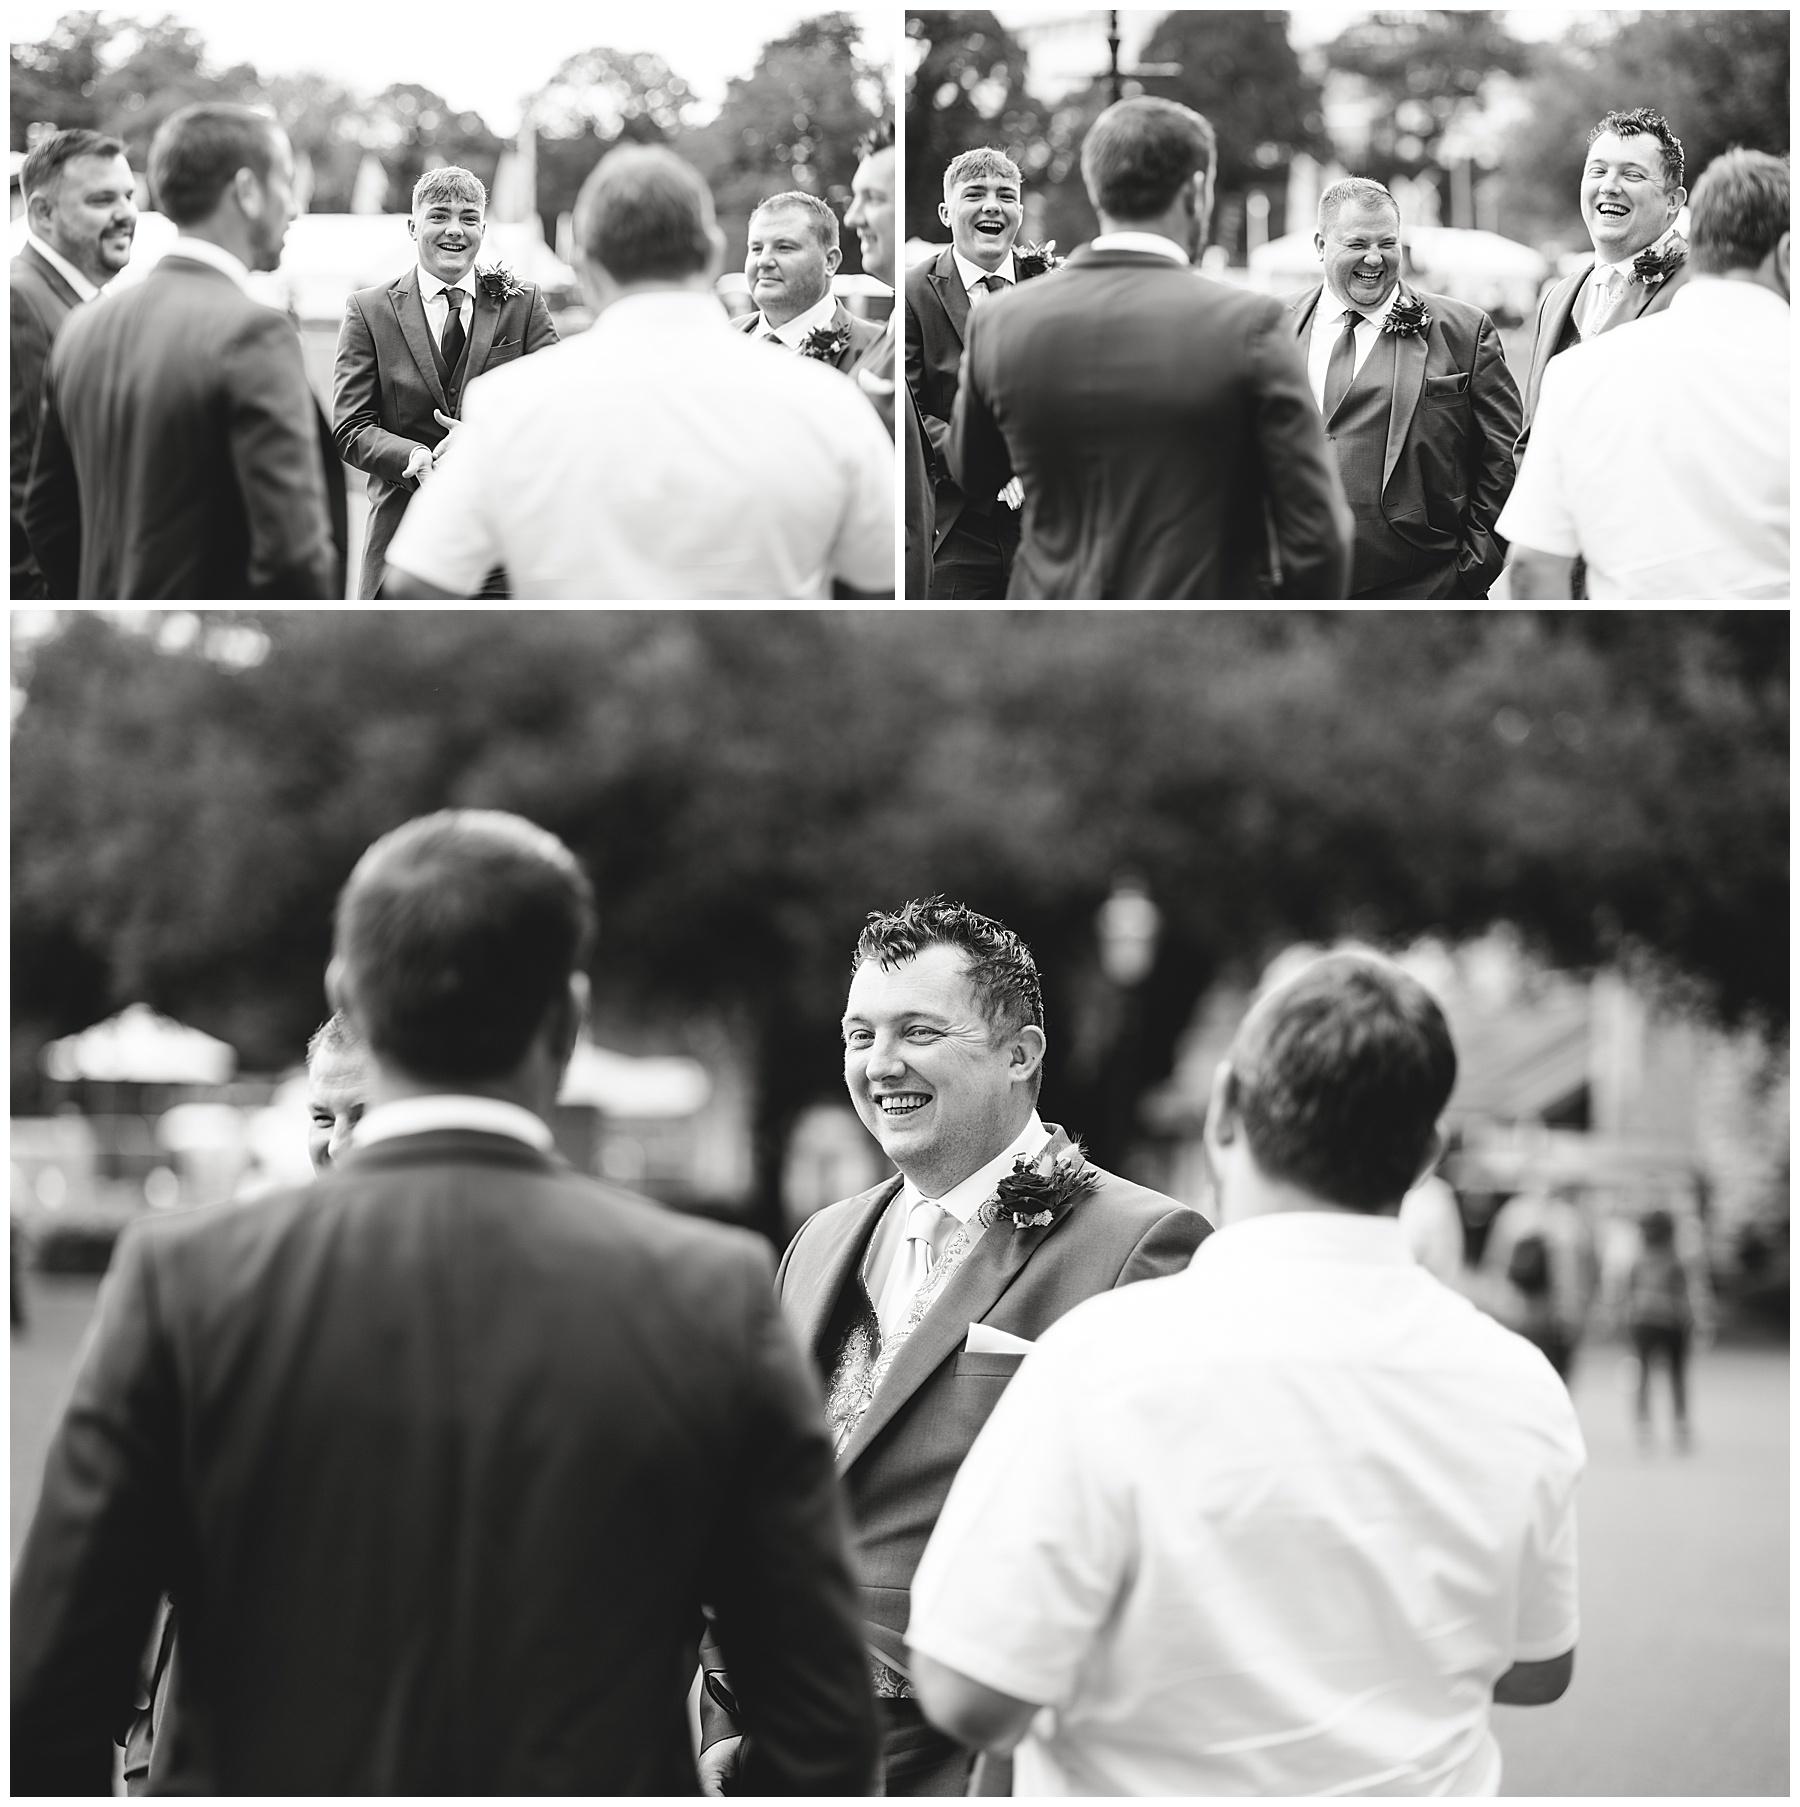 Groom at Cardiff Castle Wedding